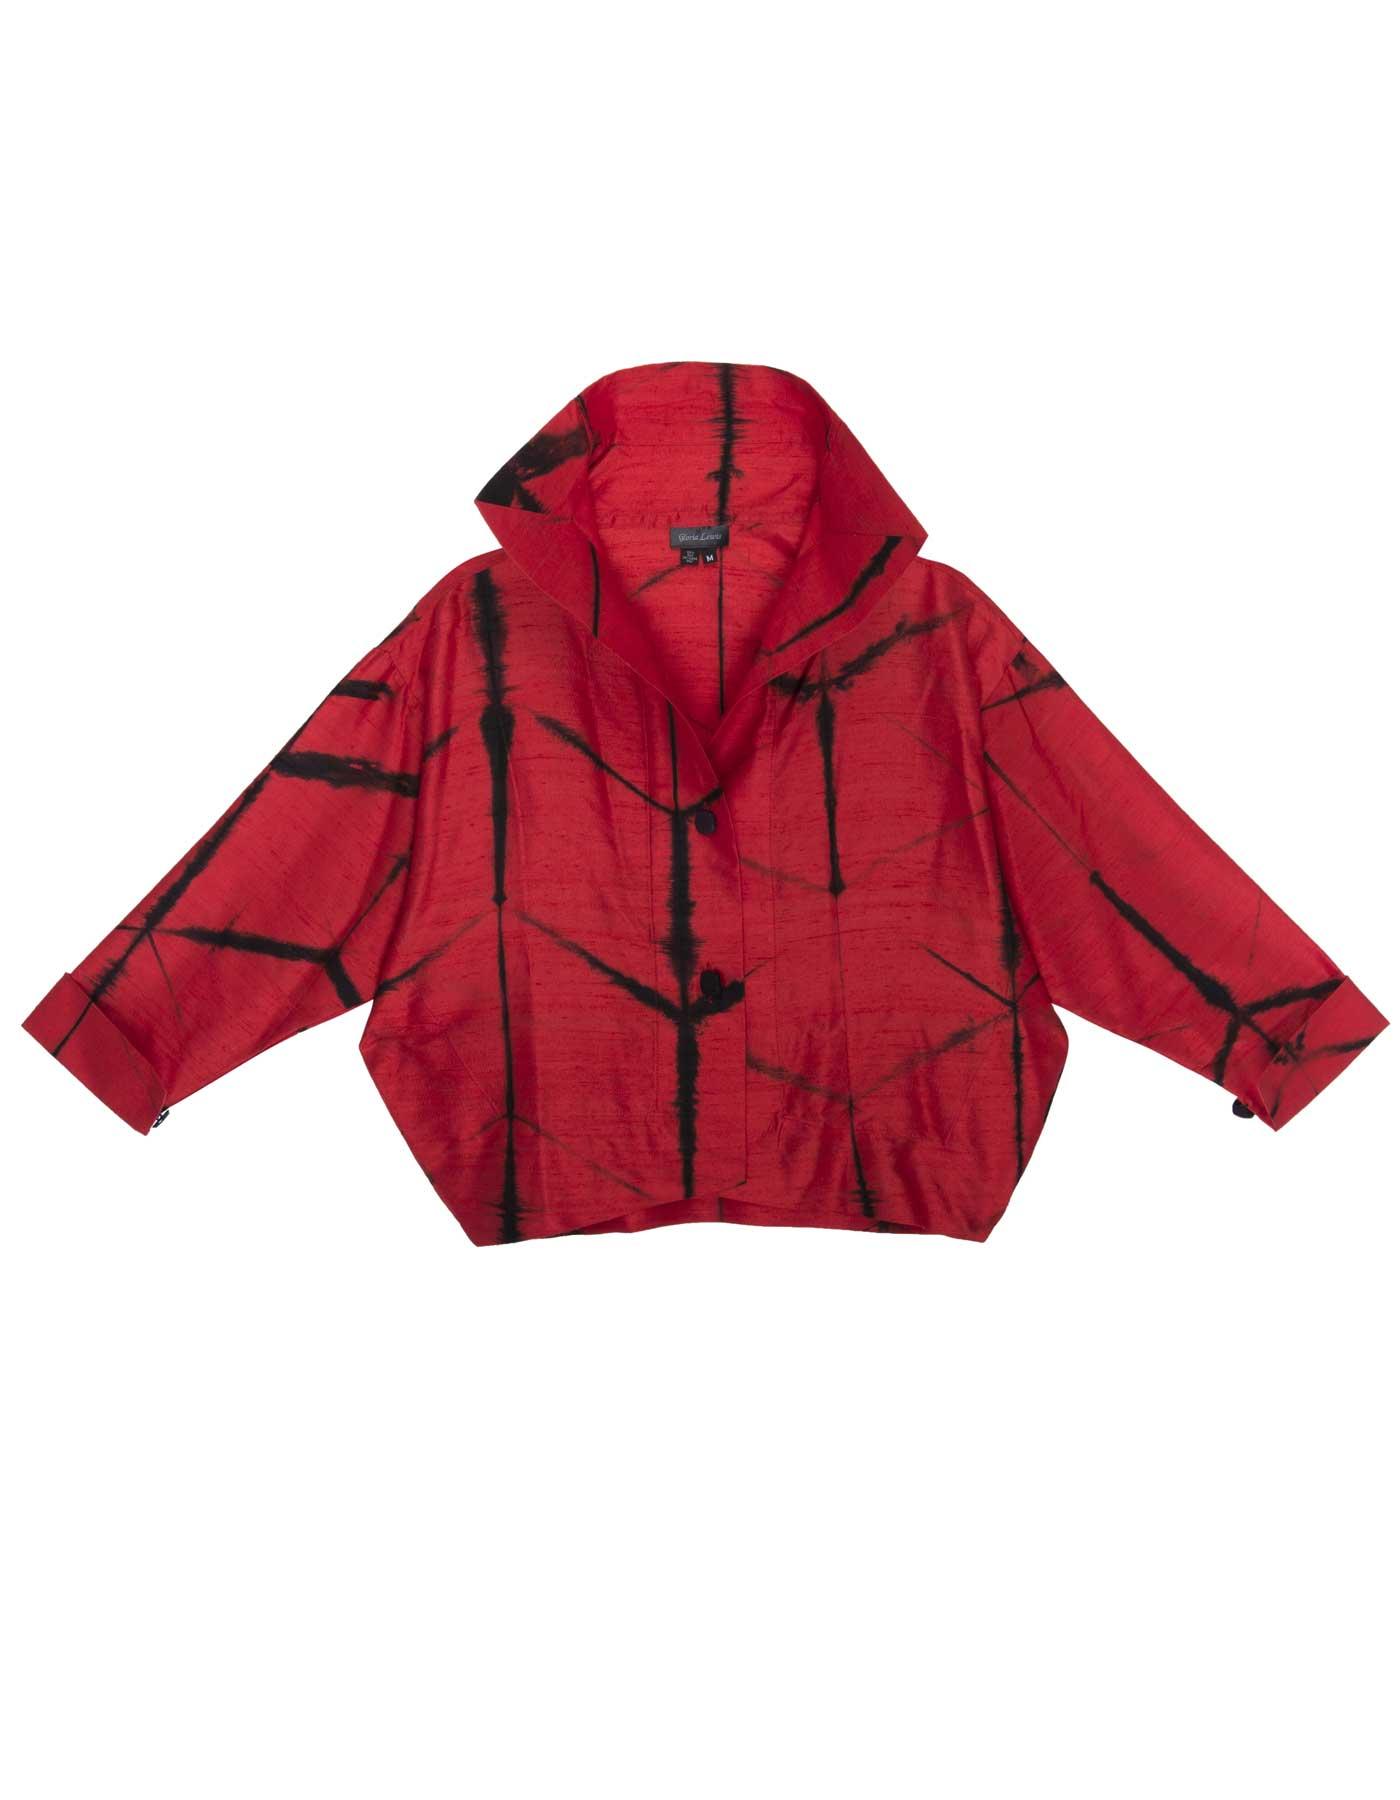 Chic Jacket 0001